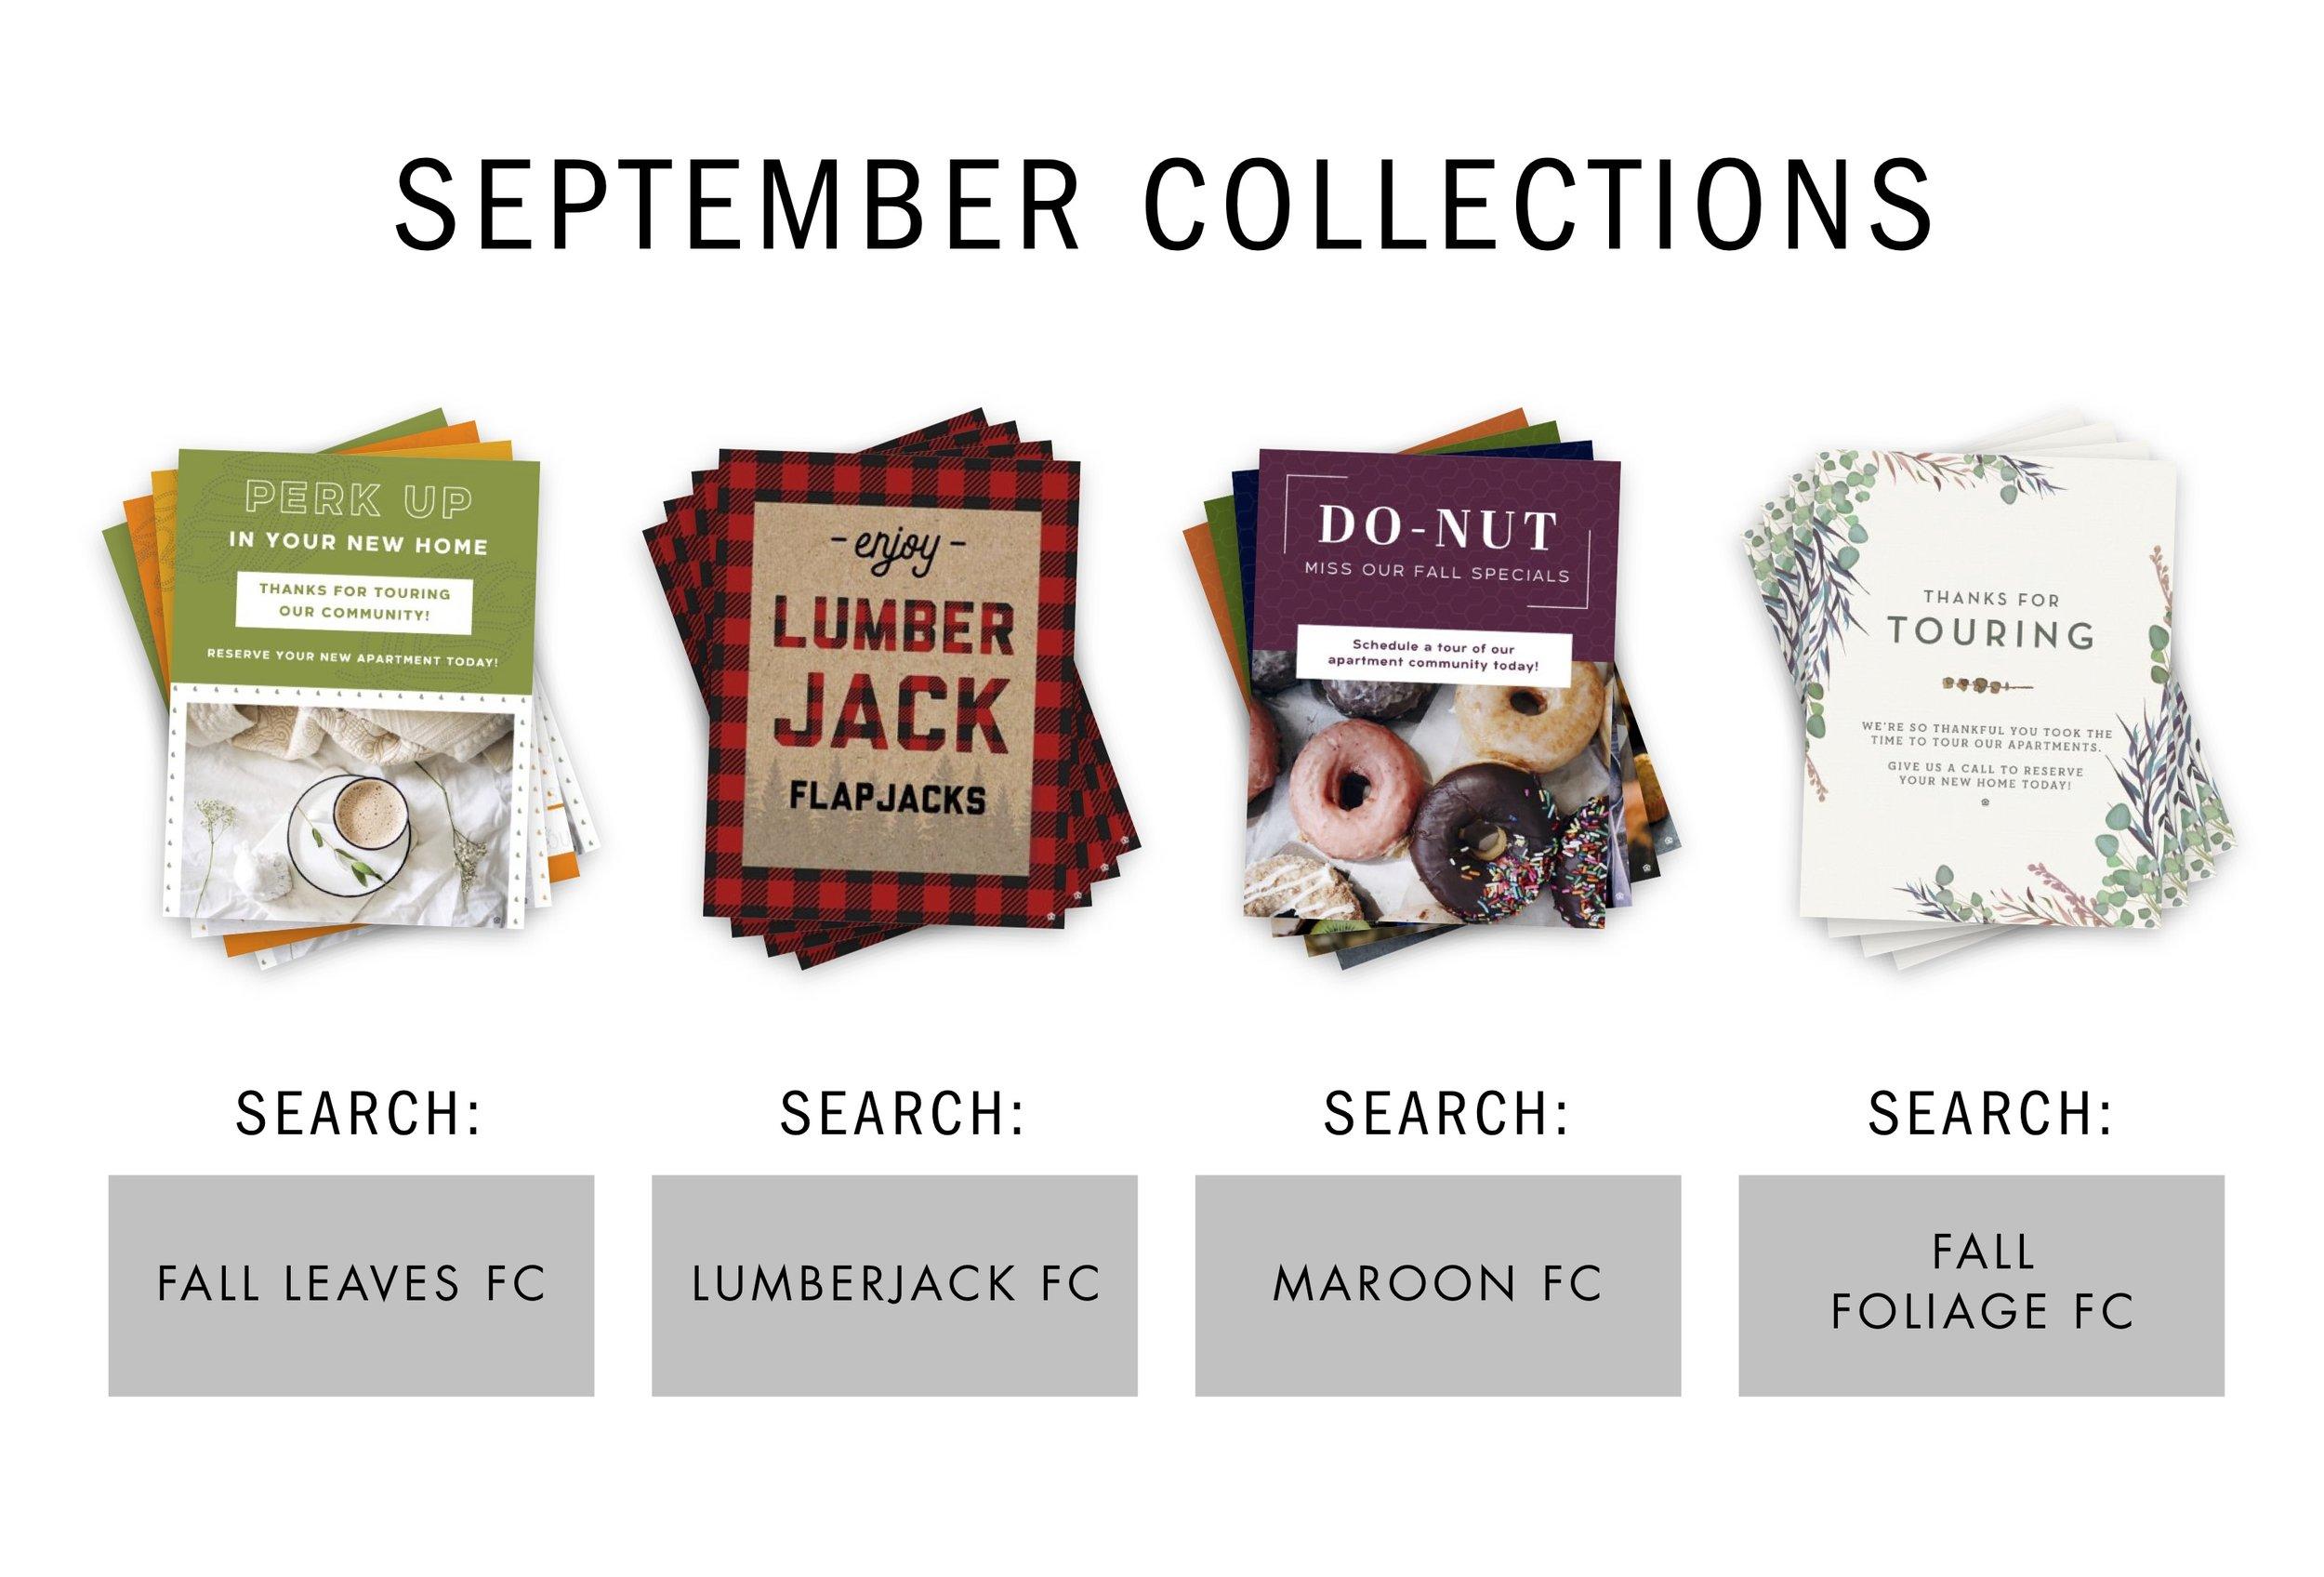 collection September Calendar Email.jpg